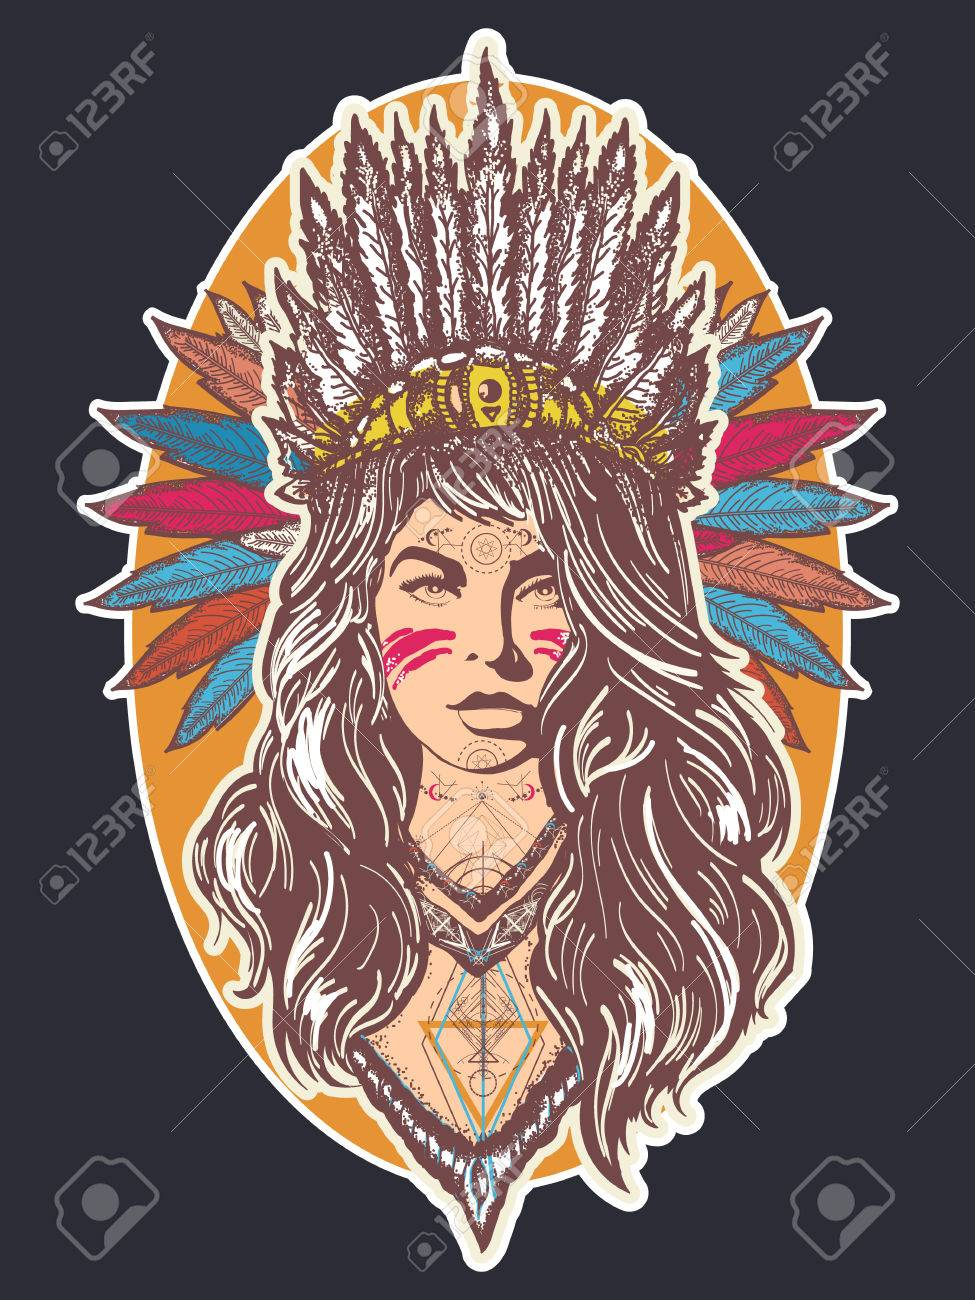 Native American Woman Tattoo Art And T Shirt Design Ethnic Girl